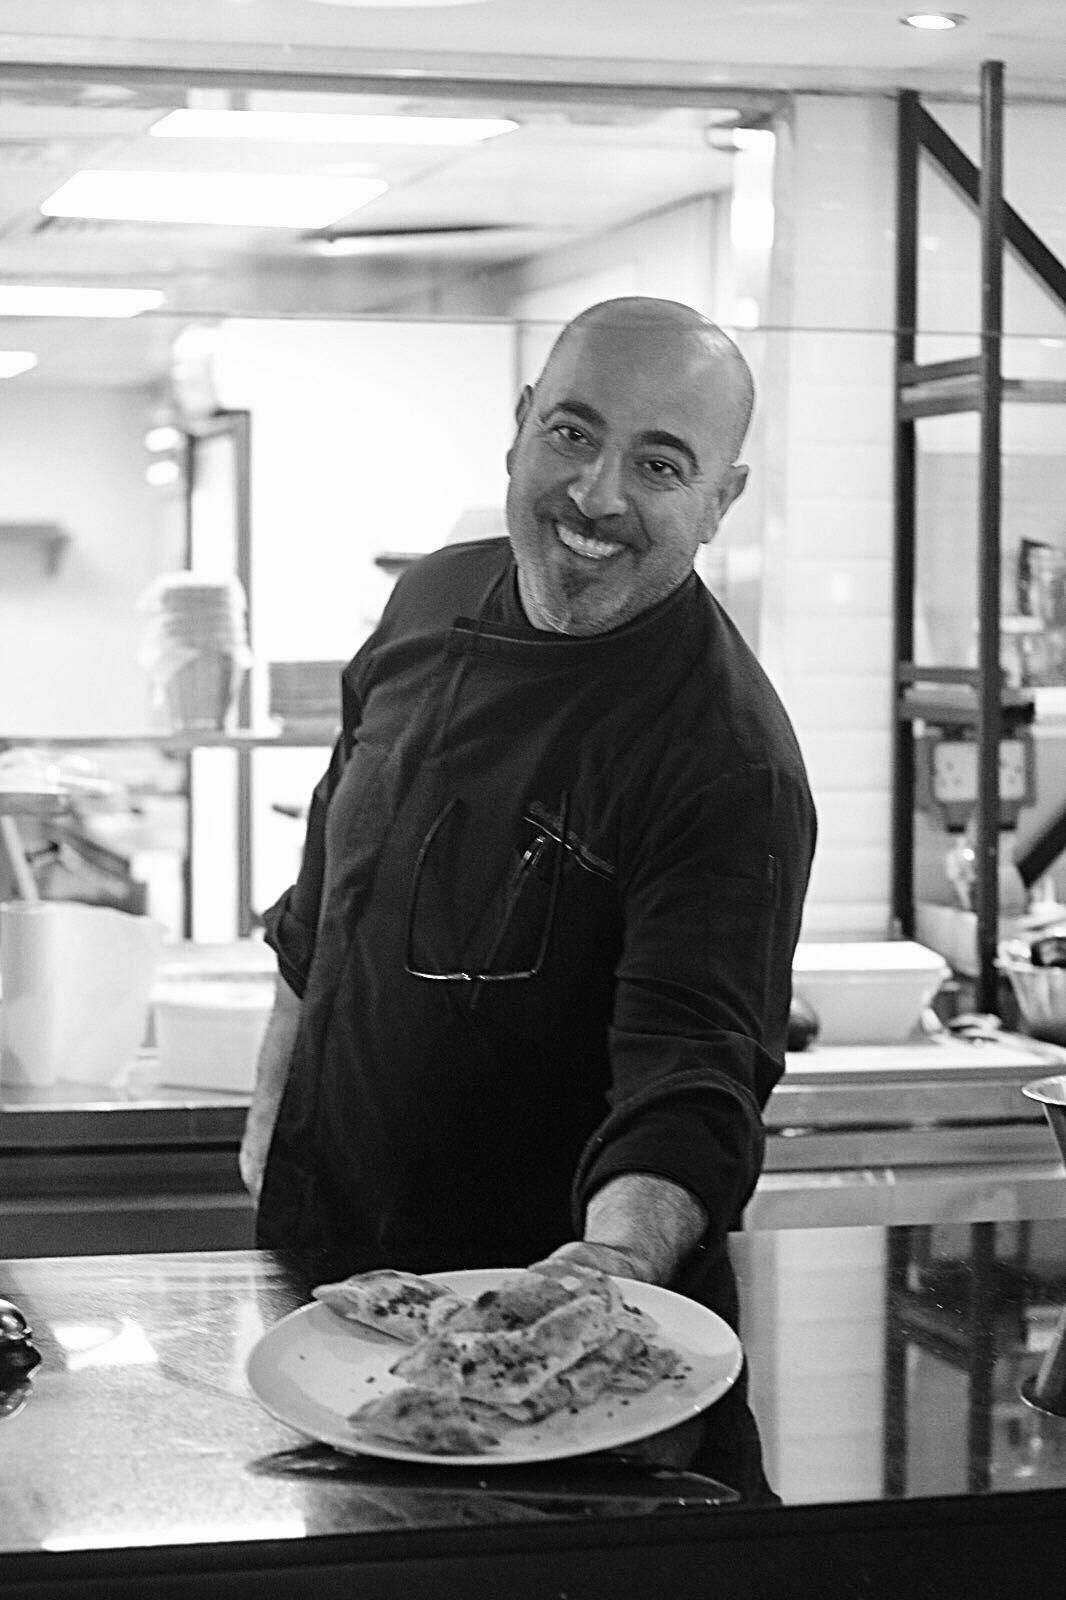 Chef Rosario Accaria